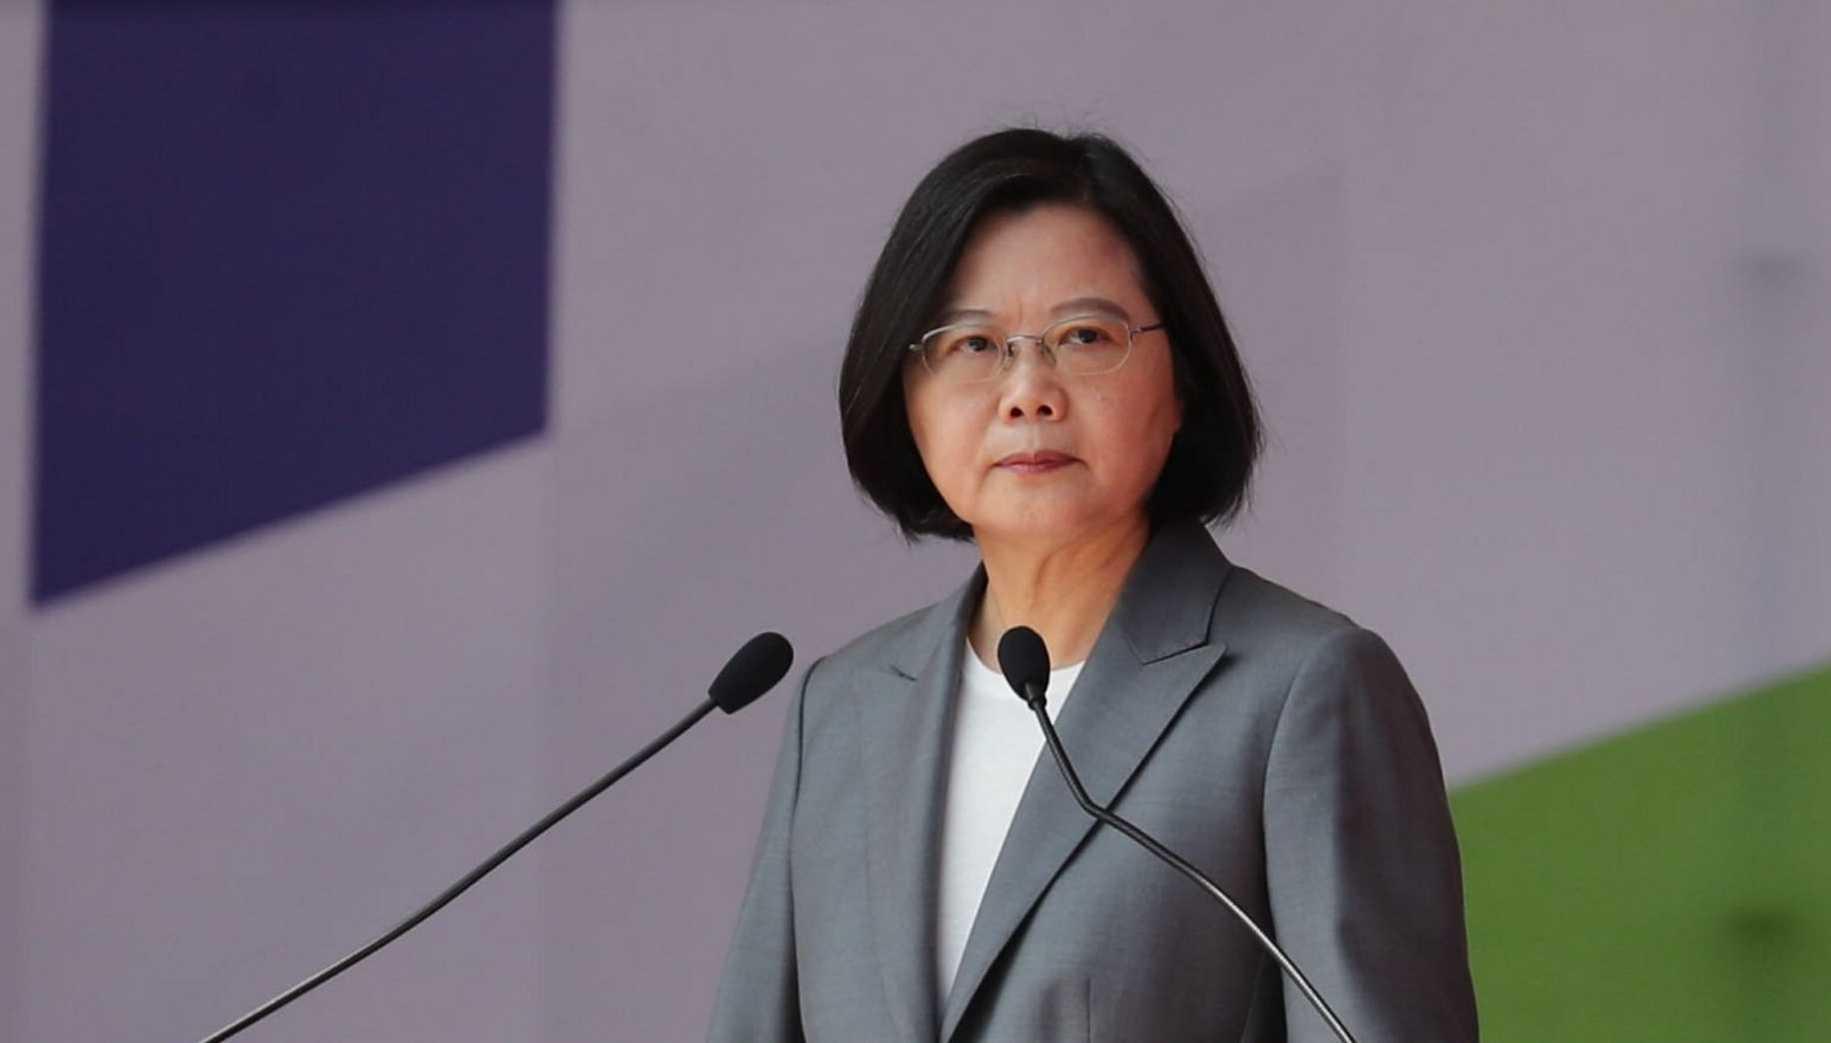 Tsai Ing-wen politician